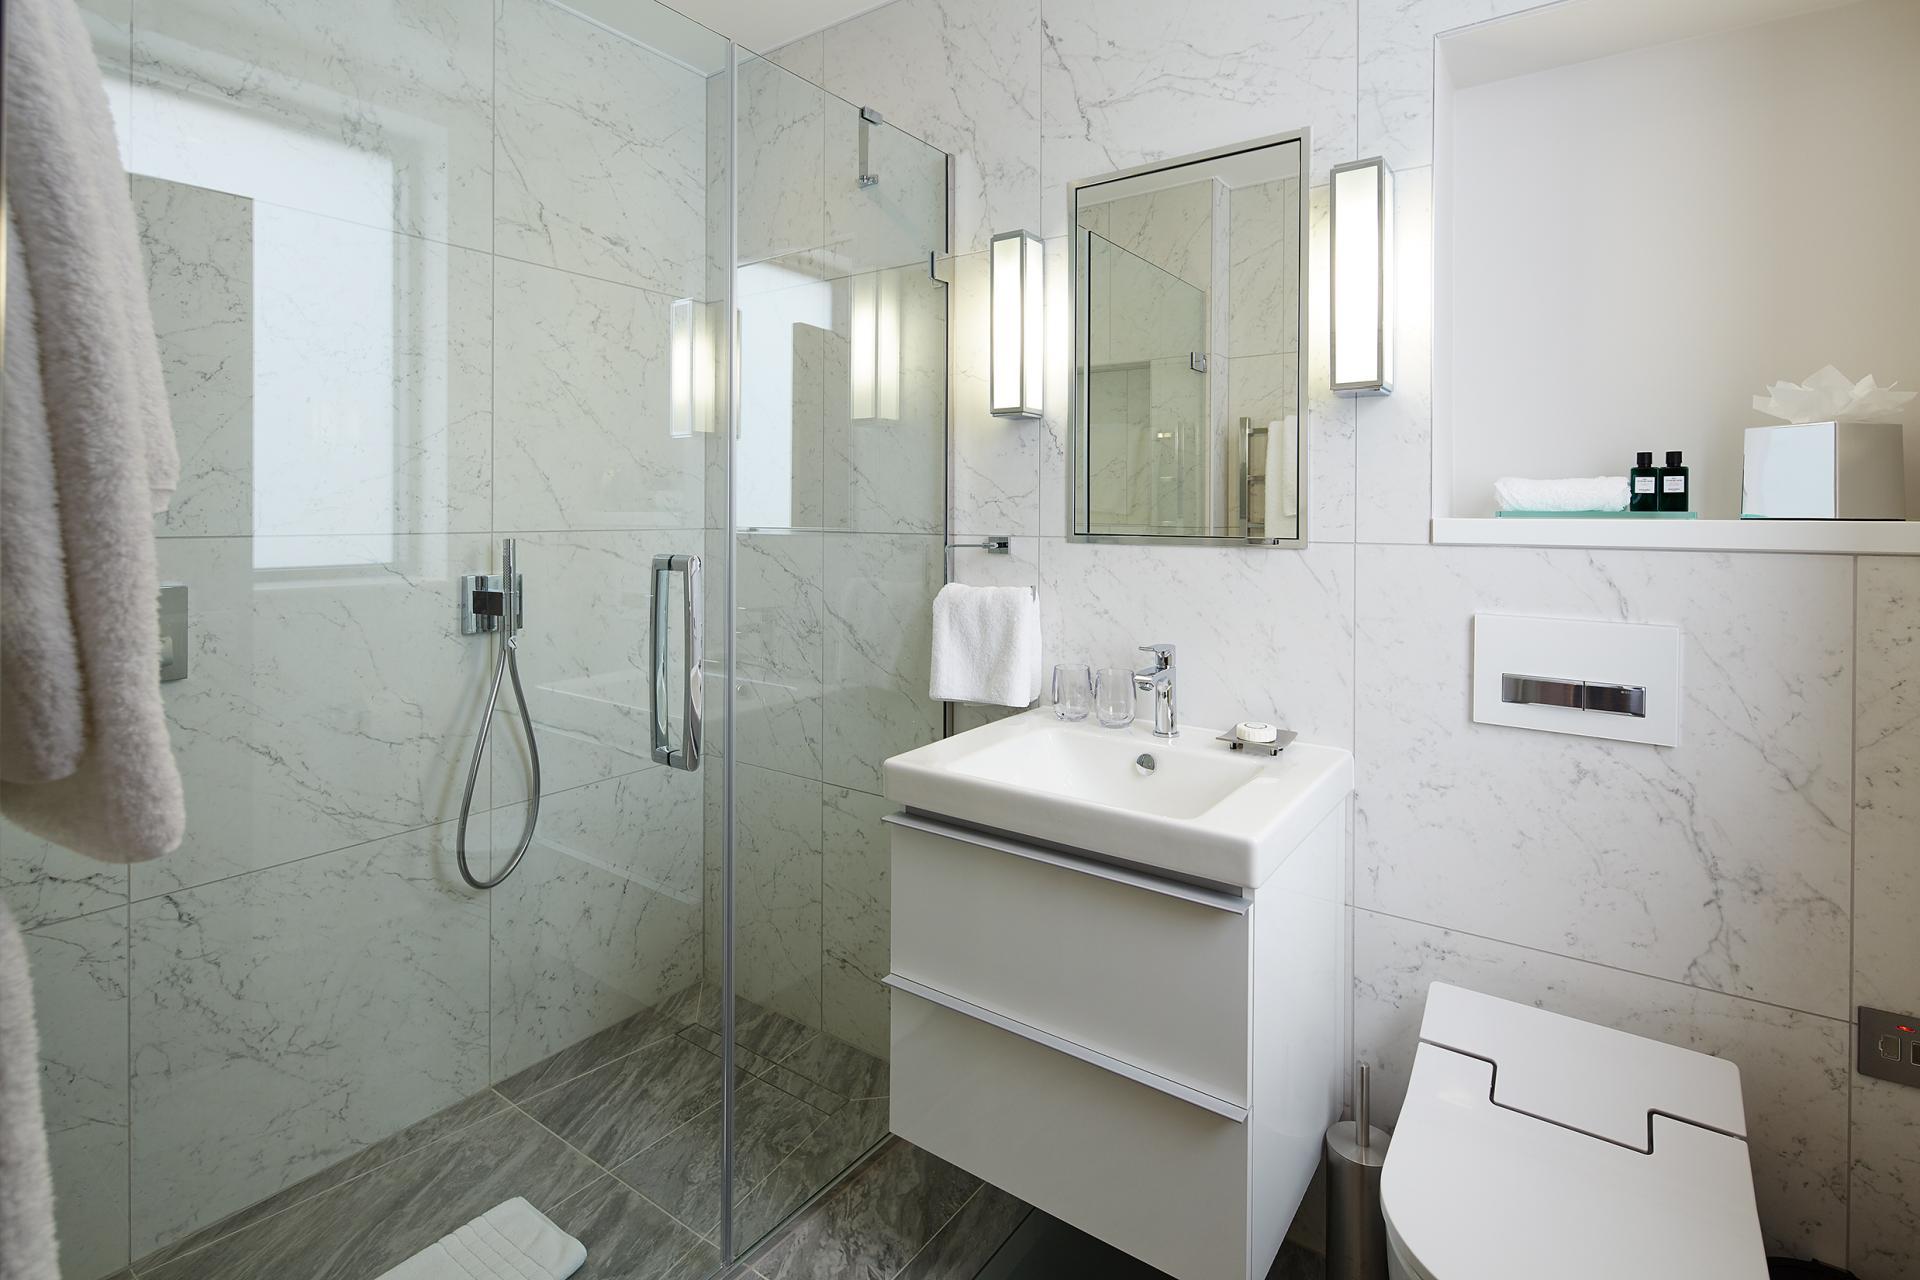 Bathroom at 29-31 Cheval Place Apartments, Knightsbridge, London - Citybase Apartments